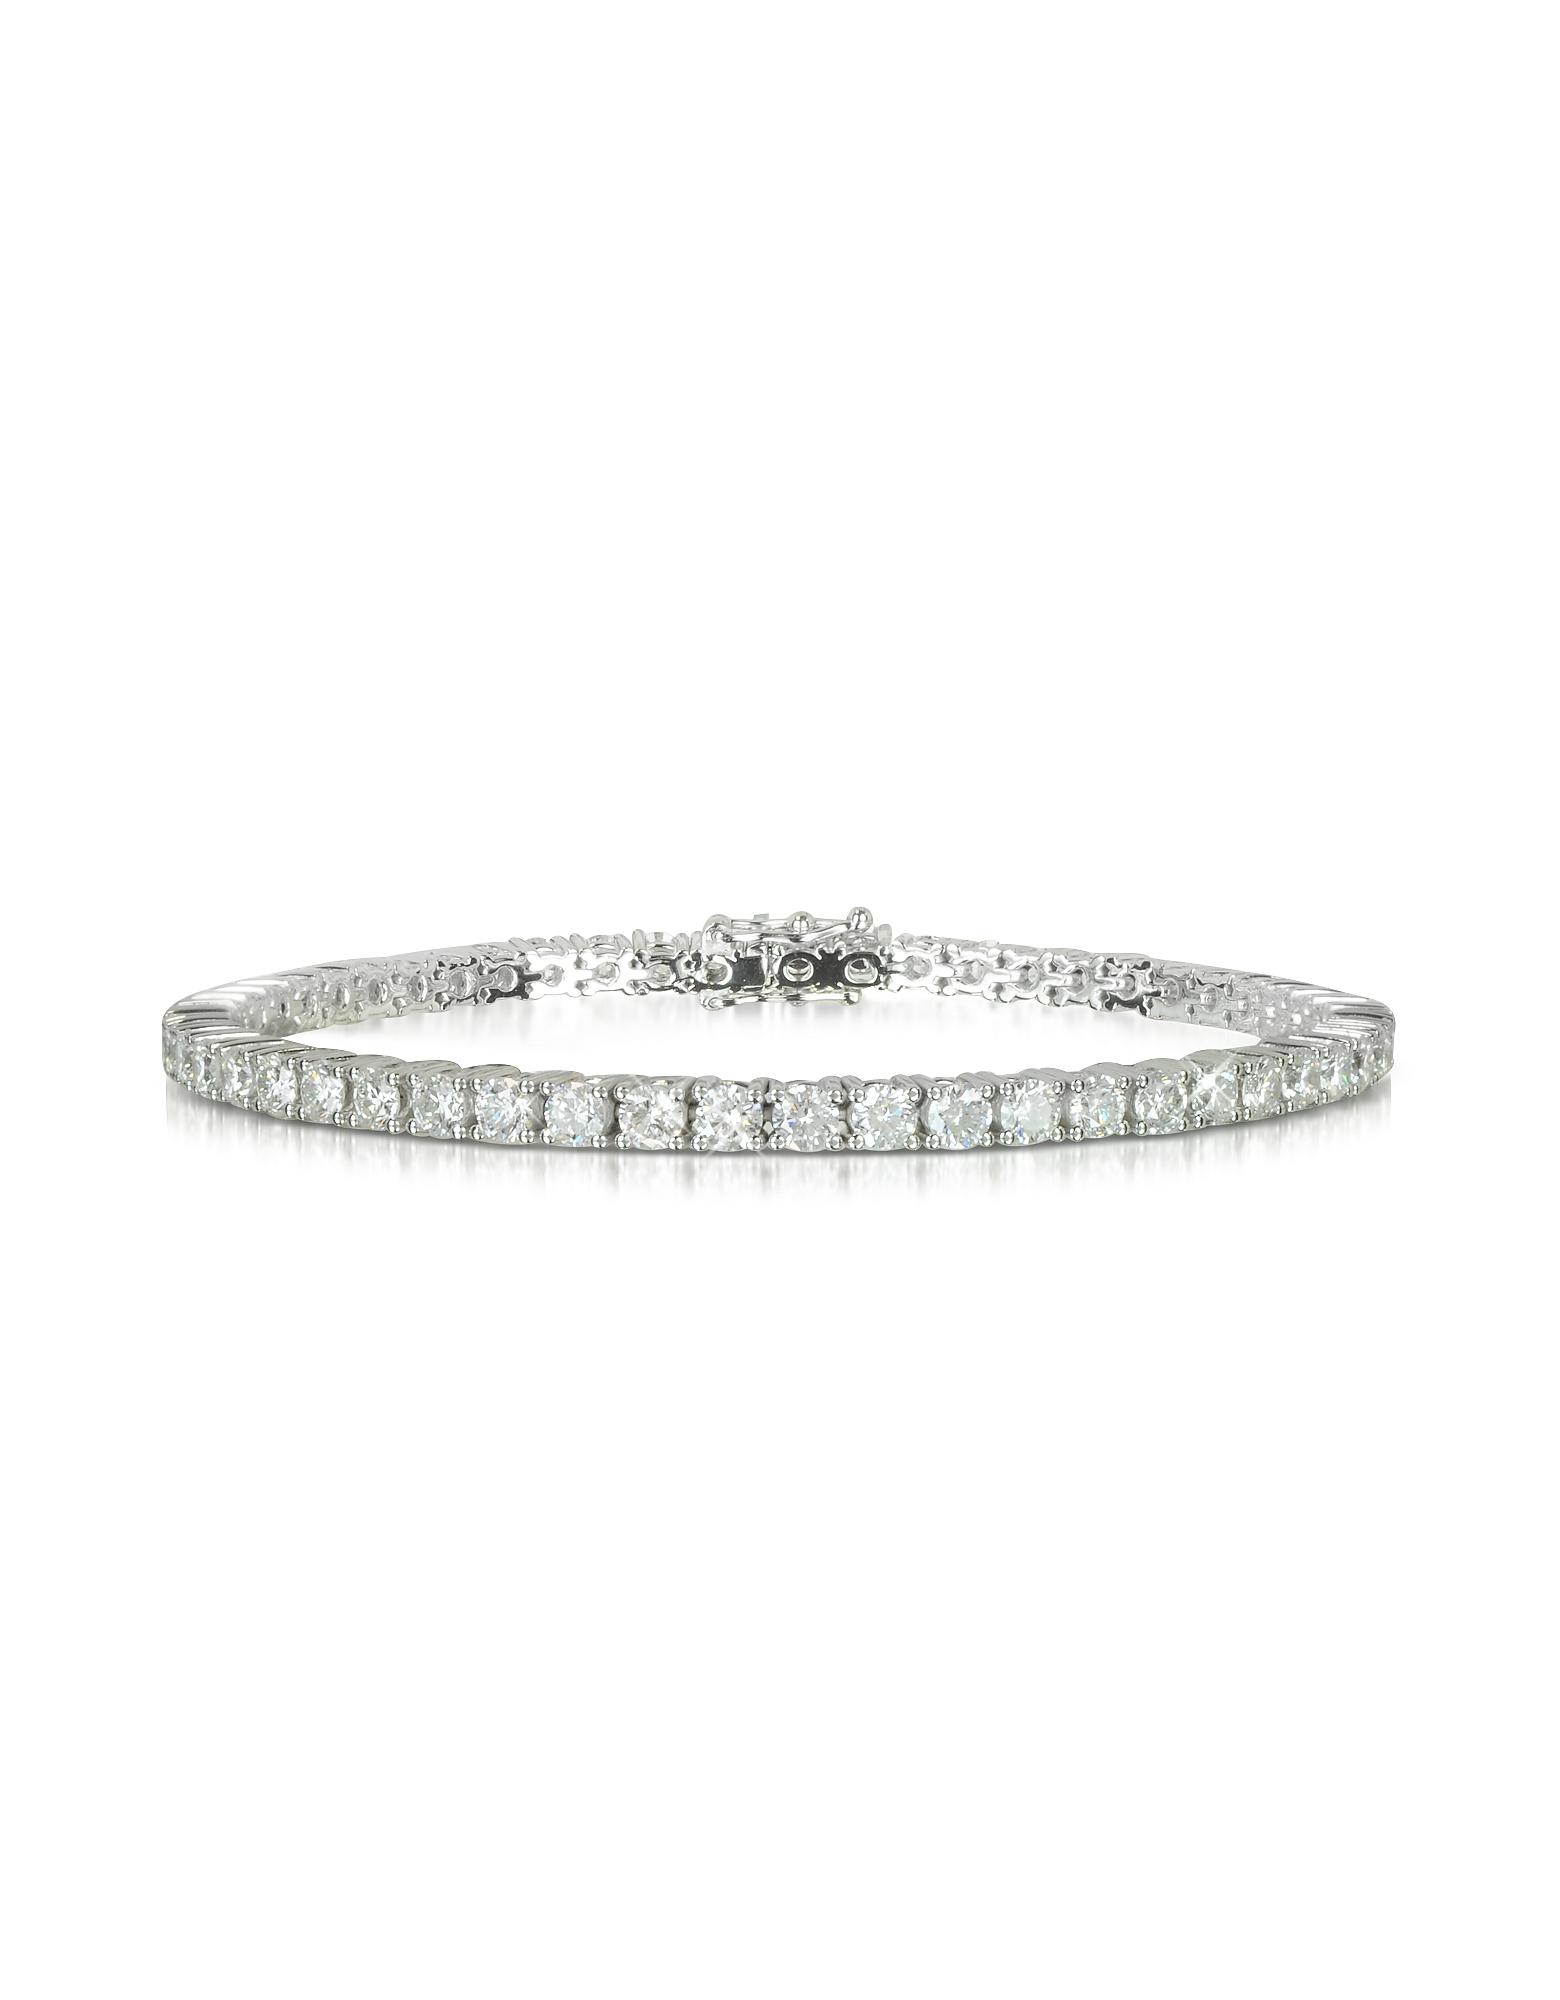 Forzieri Bracelets, 5.30 ctw Diamond 18K White Gold Tennis Bracelet